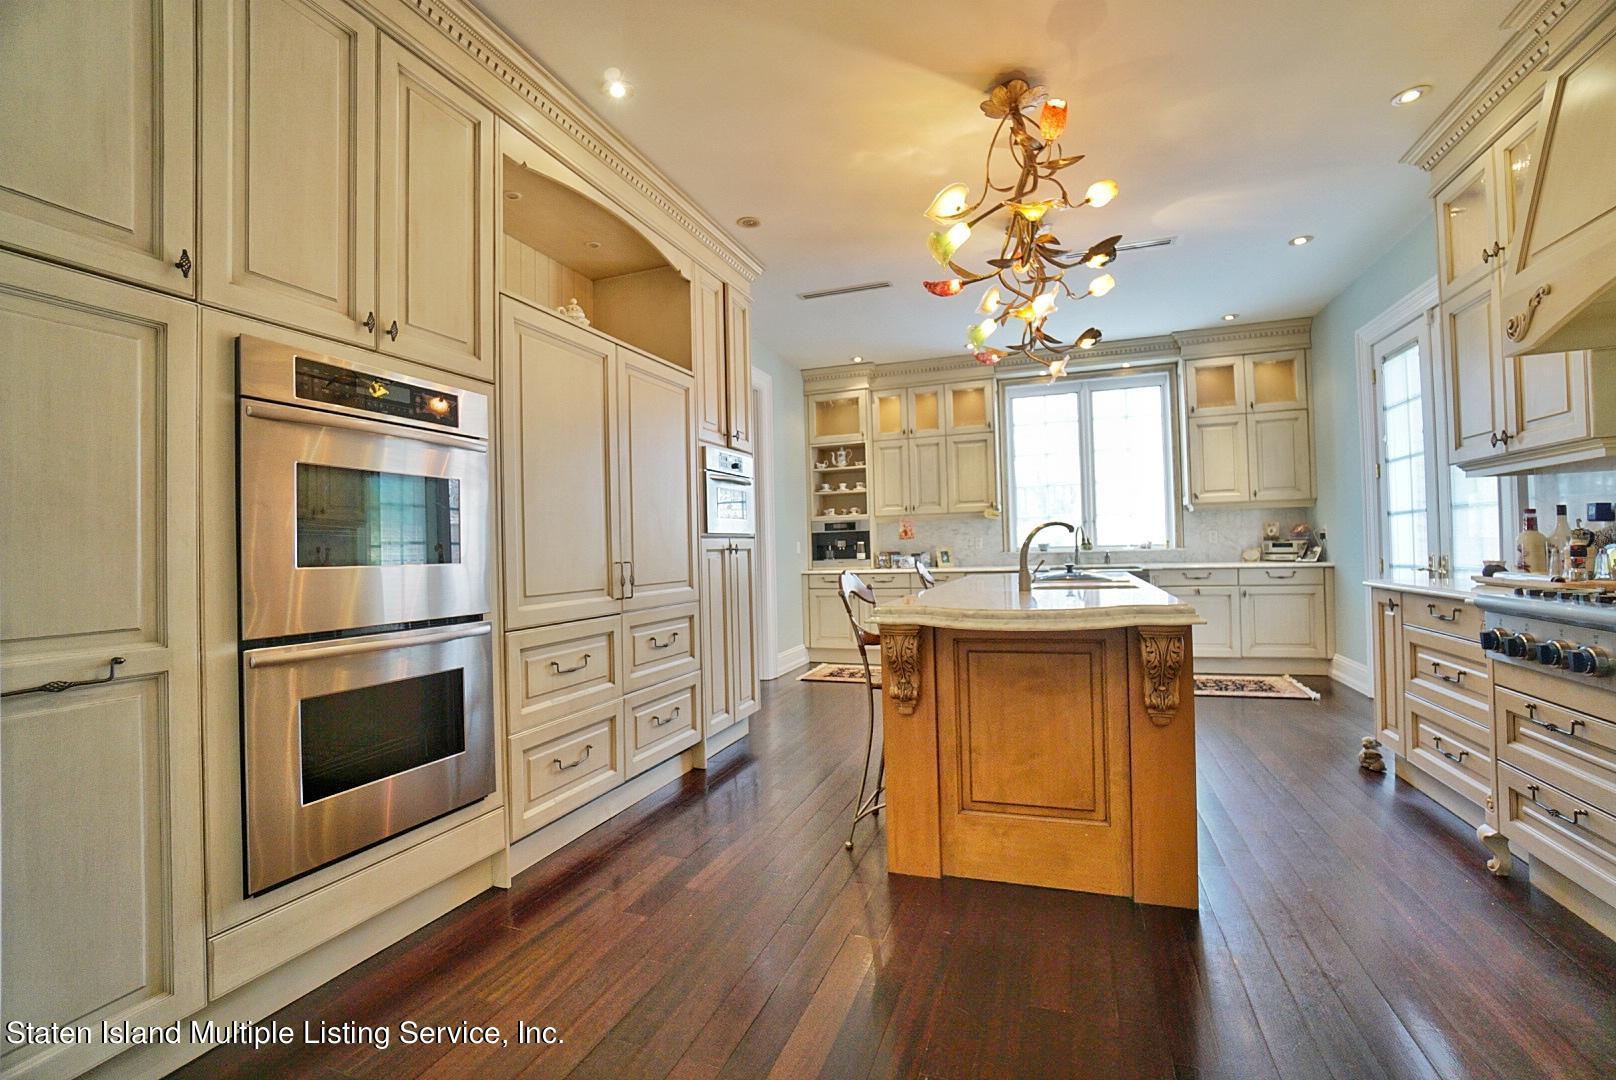 Single Family - Detached 129 Coverly Avenue   Staten Island, NY 10301, MLS-1144490-22